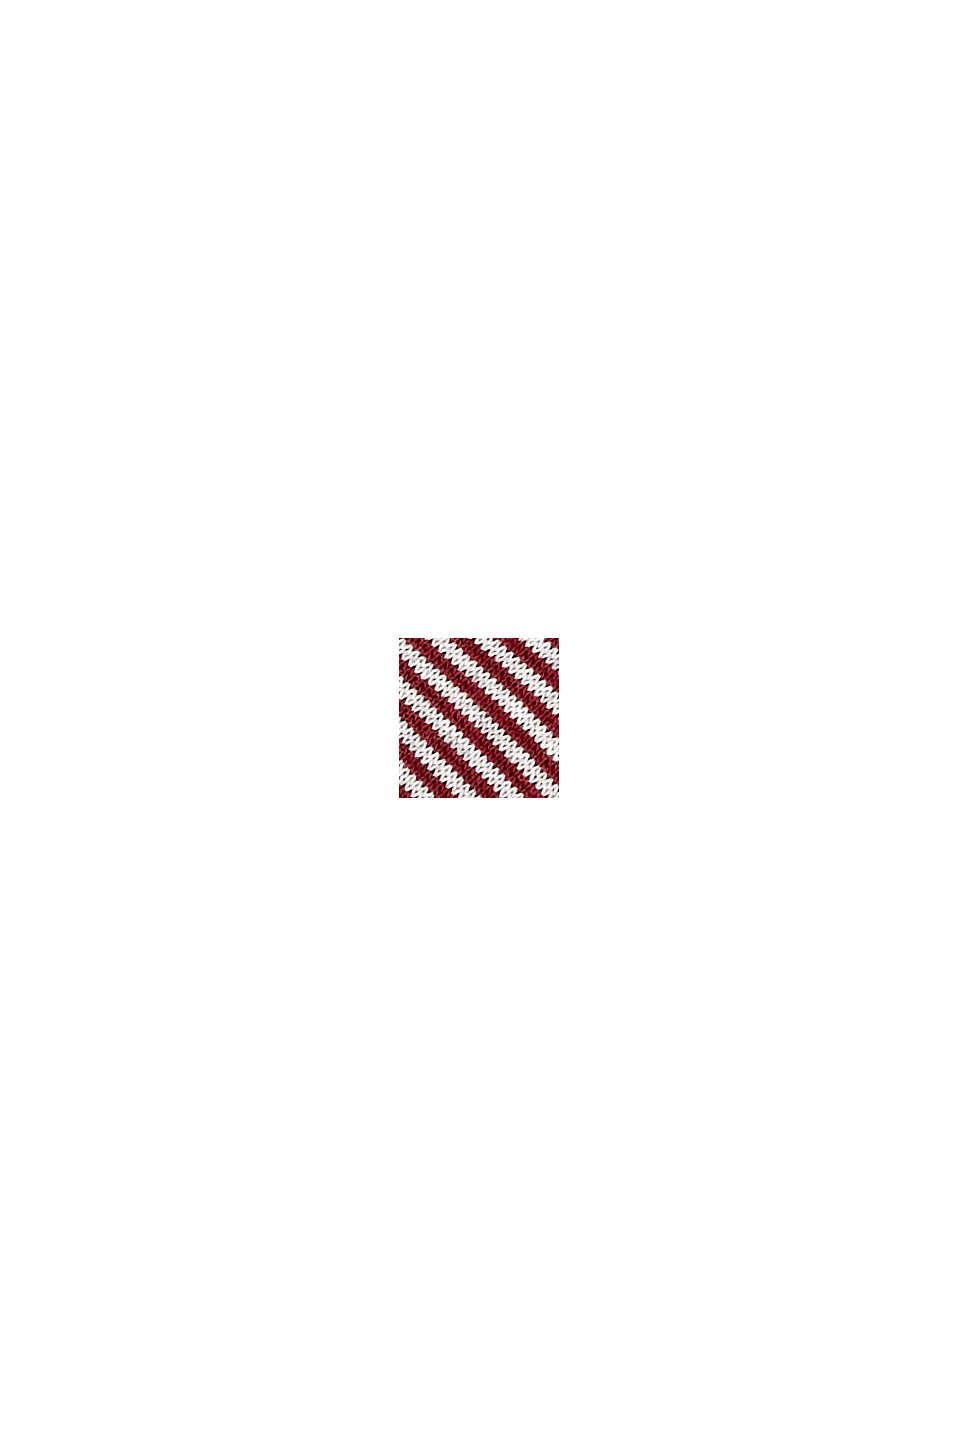 Randiga strumpor i bomullsmix, 2-pack, RED/BORDEAUX, swatch